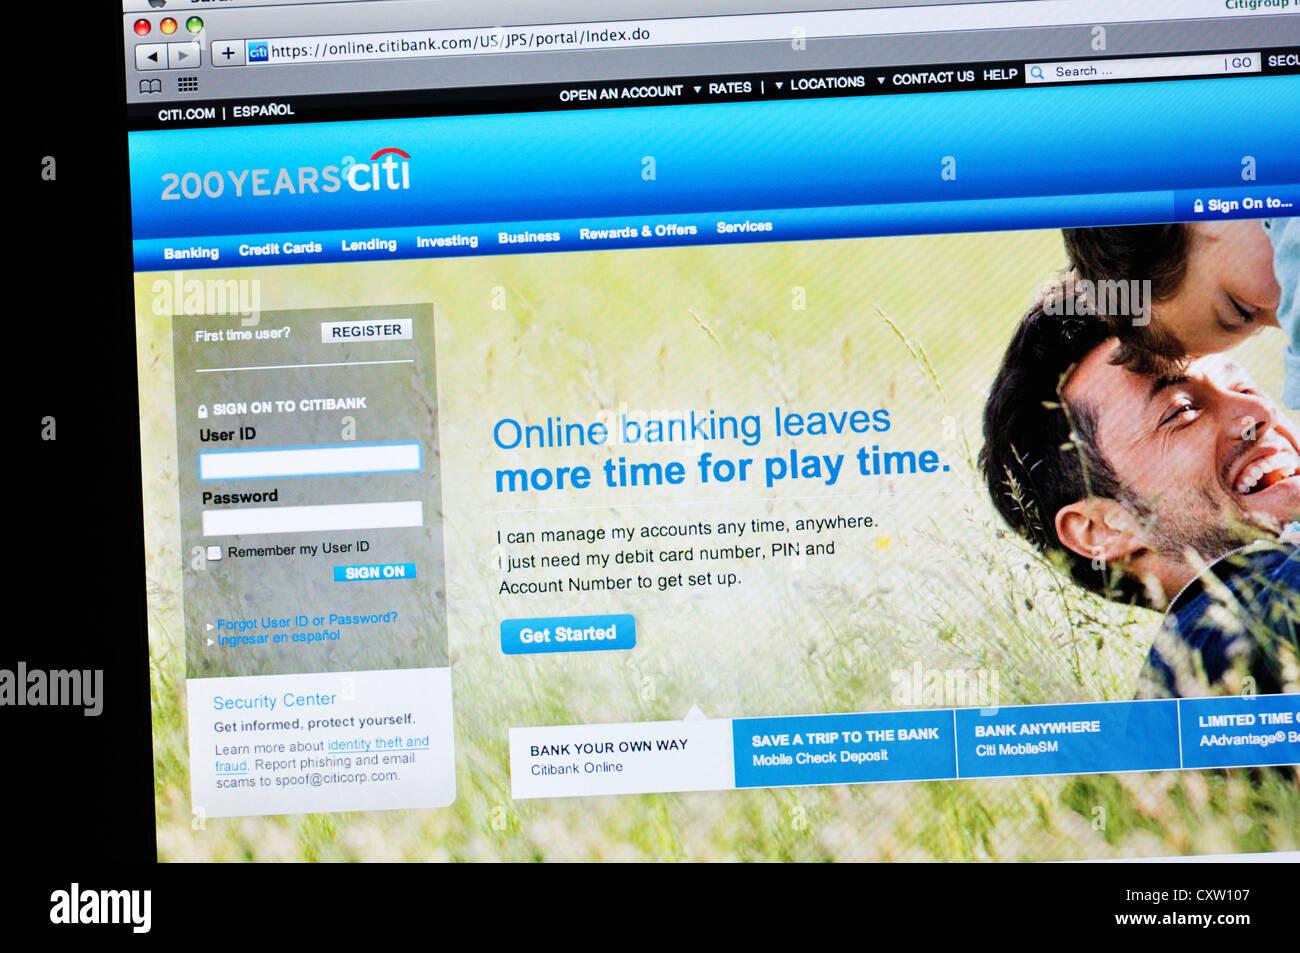 Citi bank website - online banking Stock Photo - Alamy